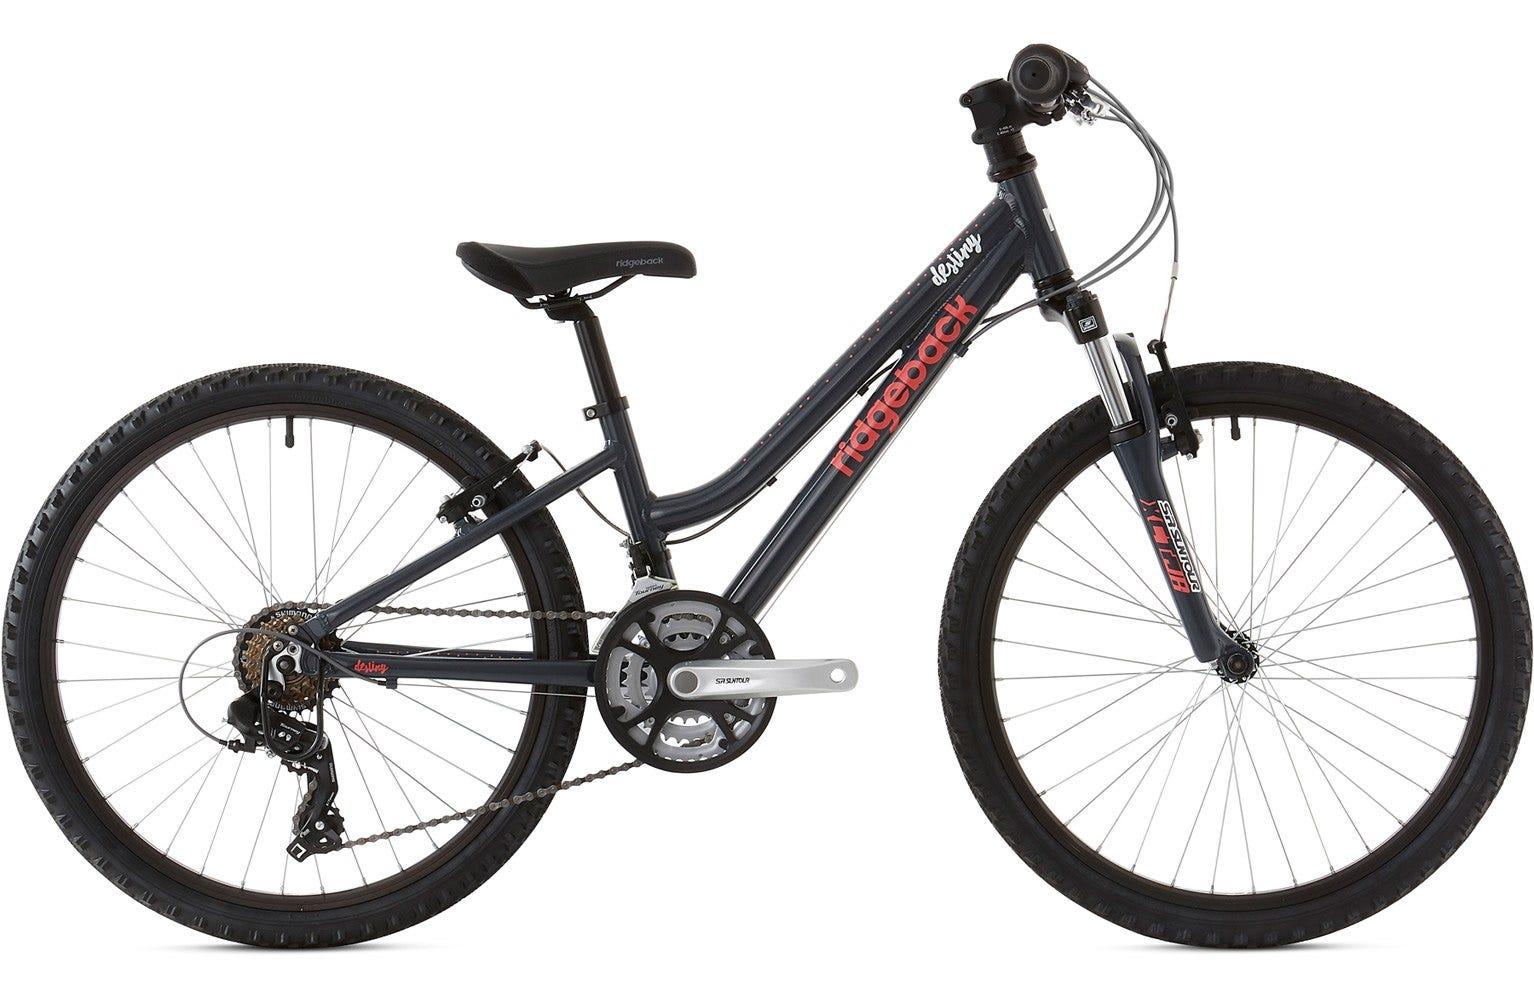 Ridgeback 2020 Destiny 24 Inch Wheel Charcoal Ex Display Bike